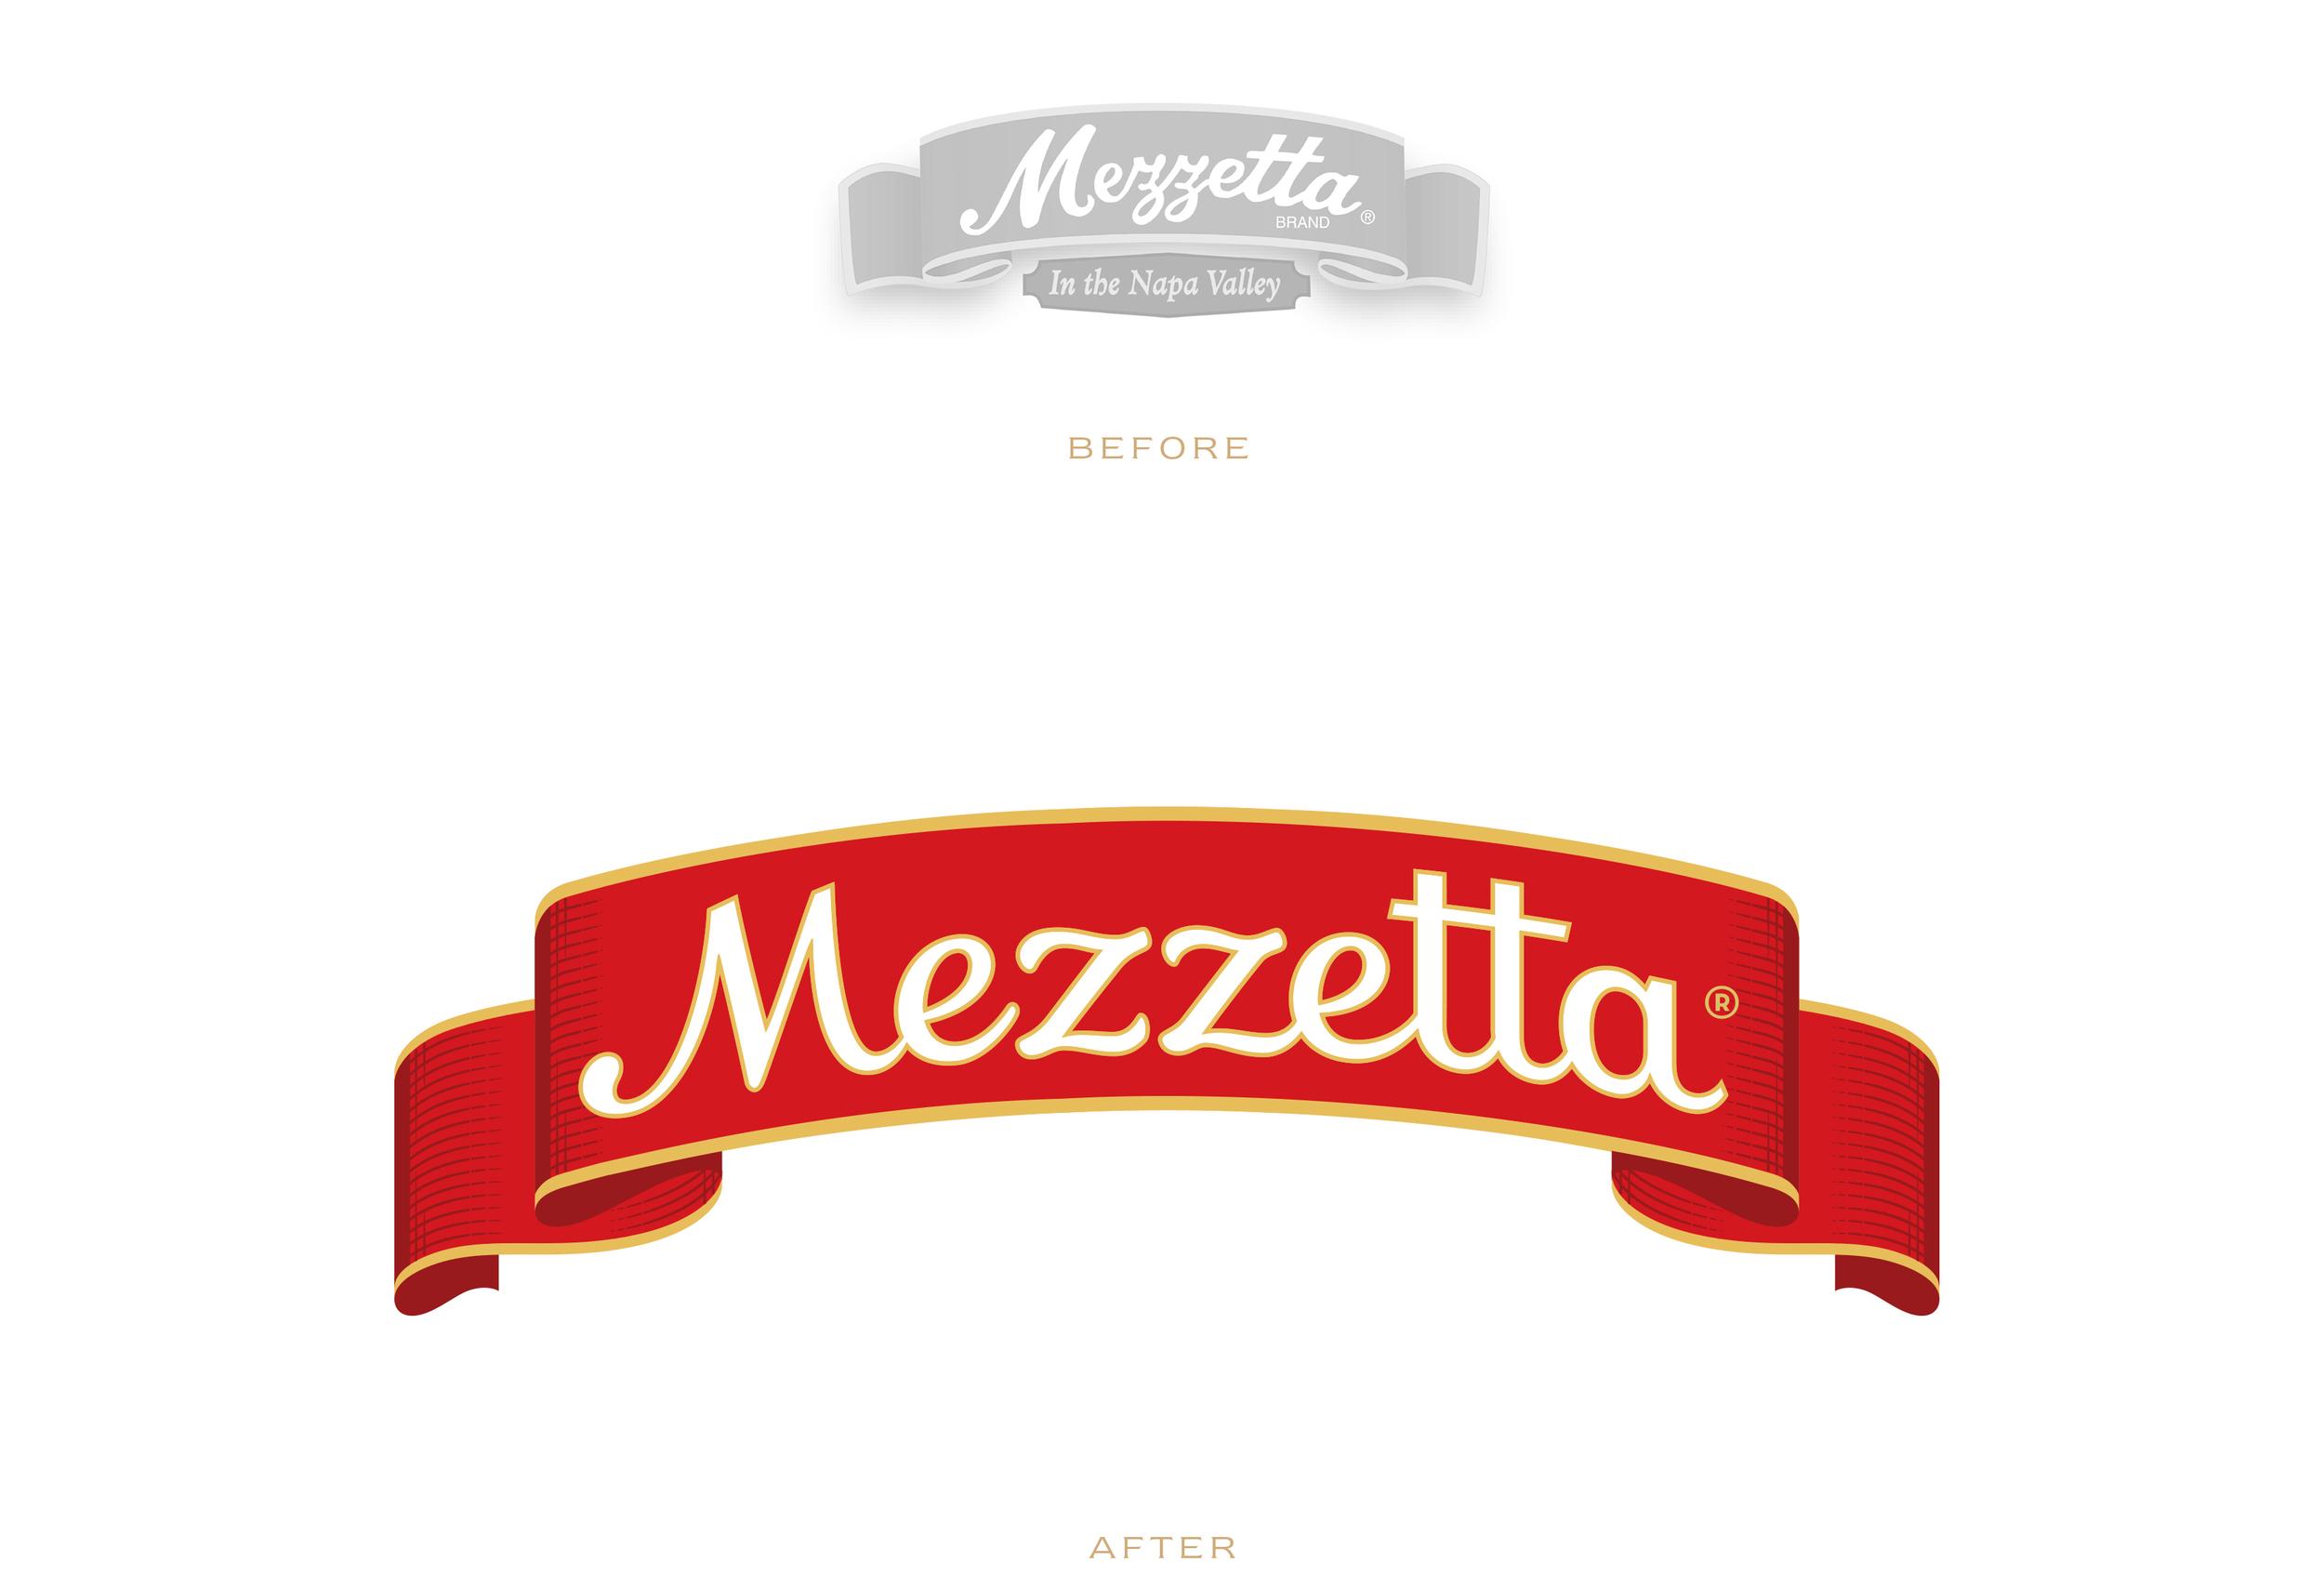 BA_Mezzetta.jpg